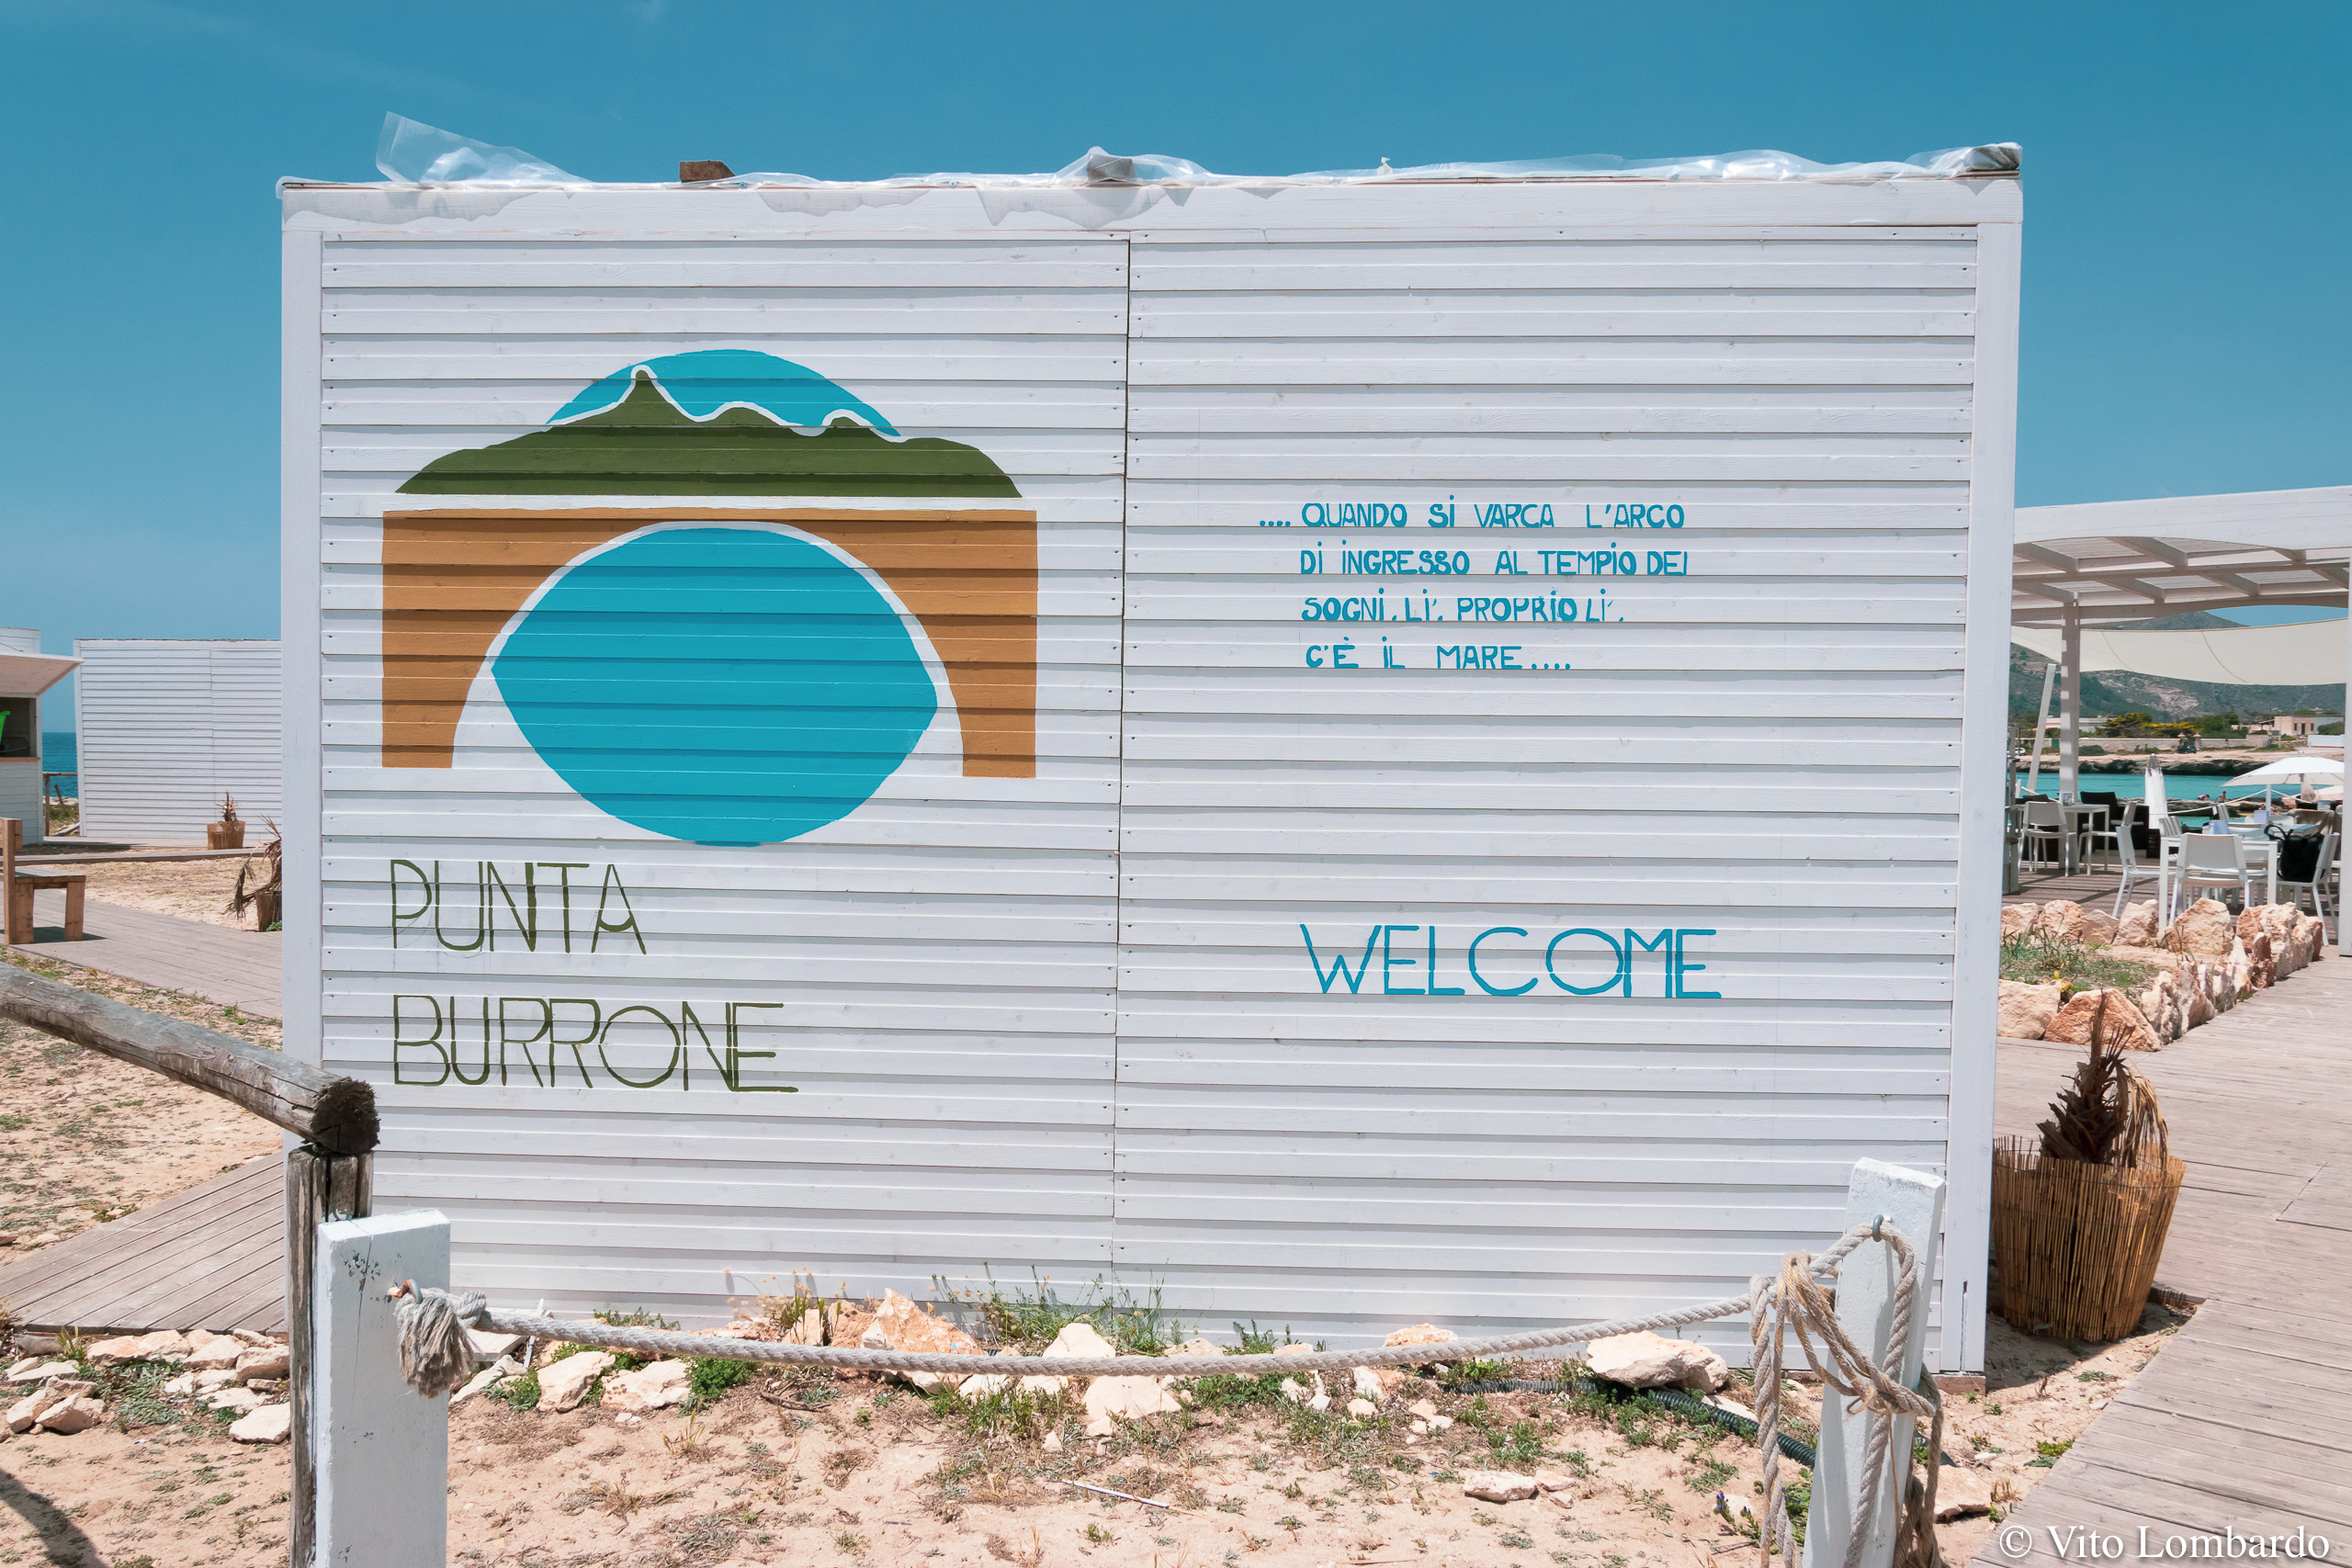 Lido Punta Burrone